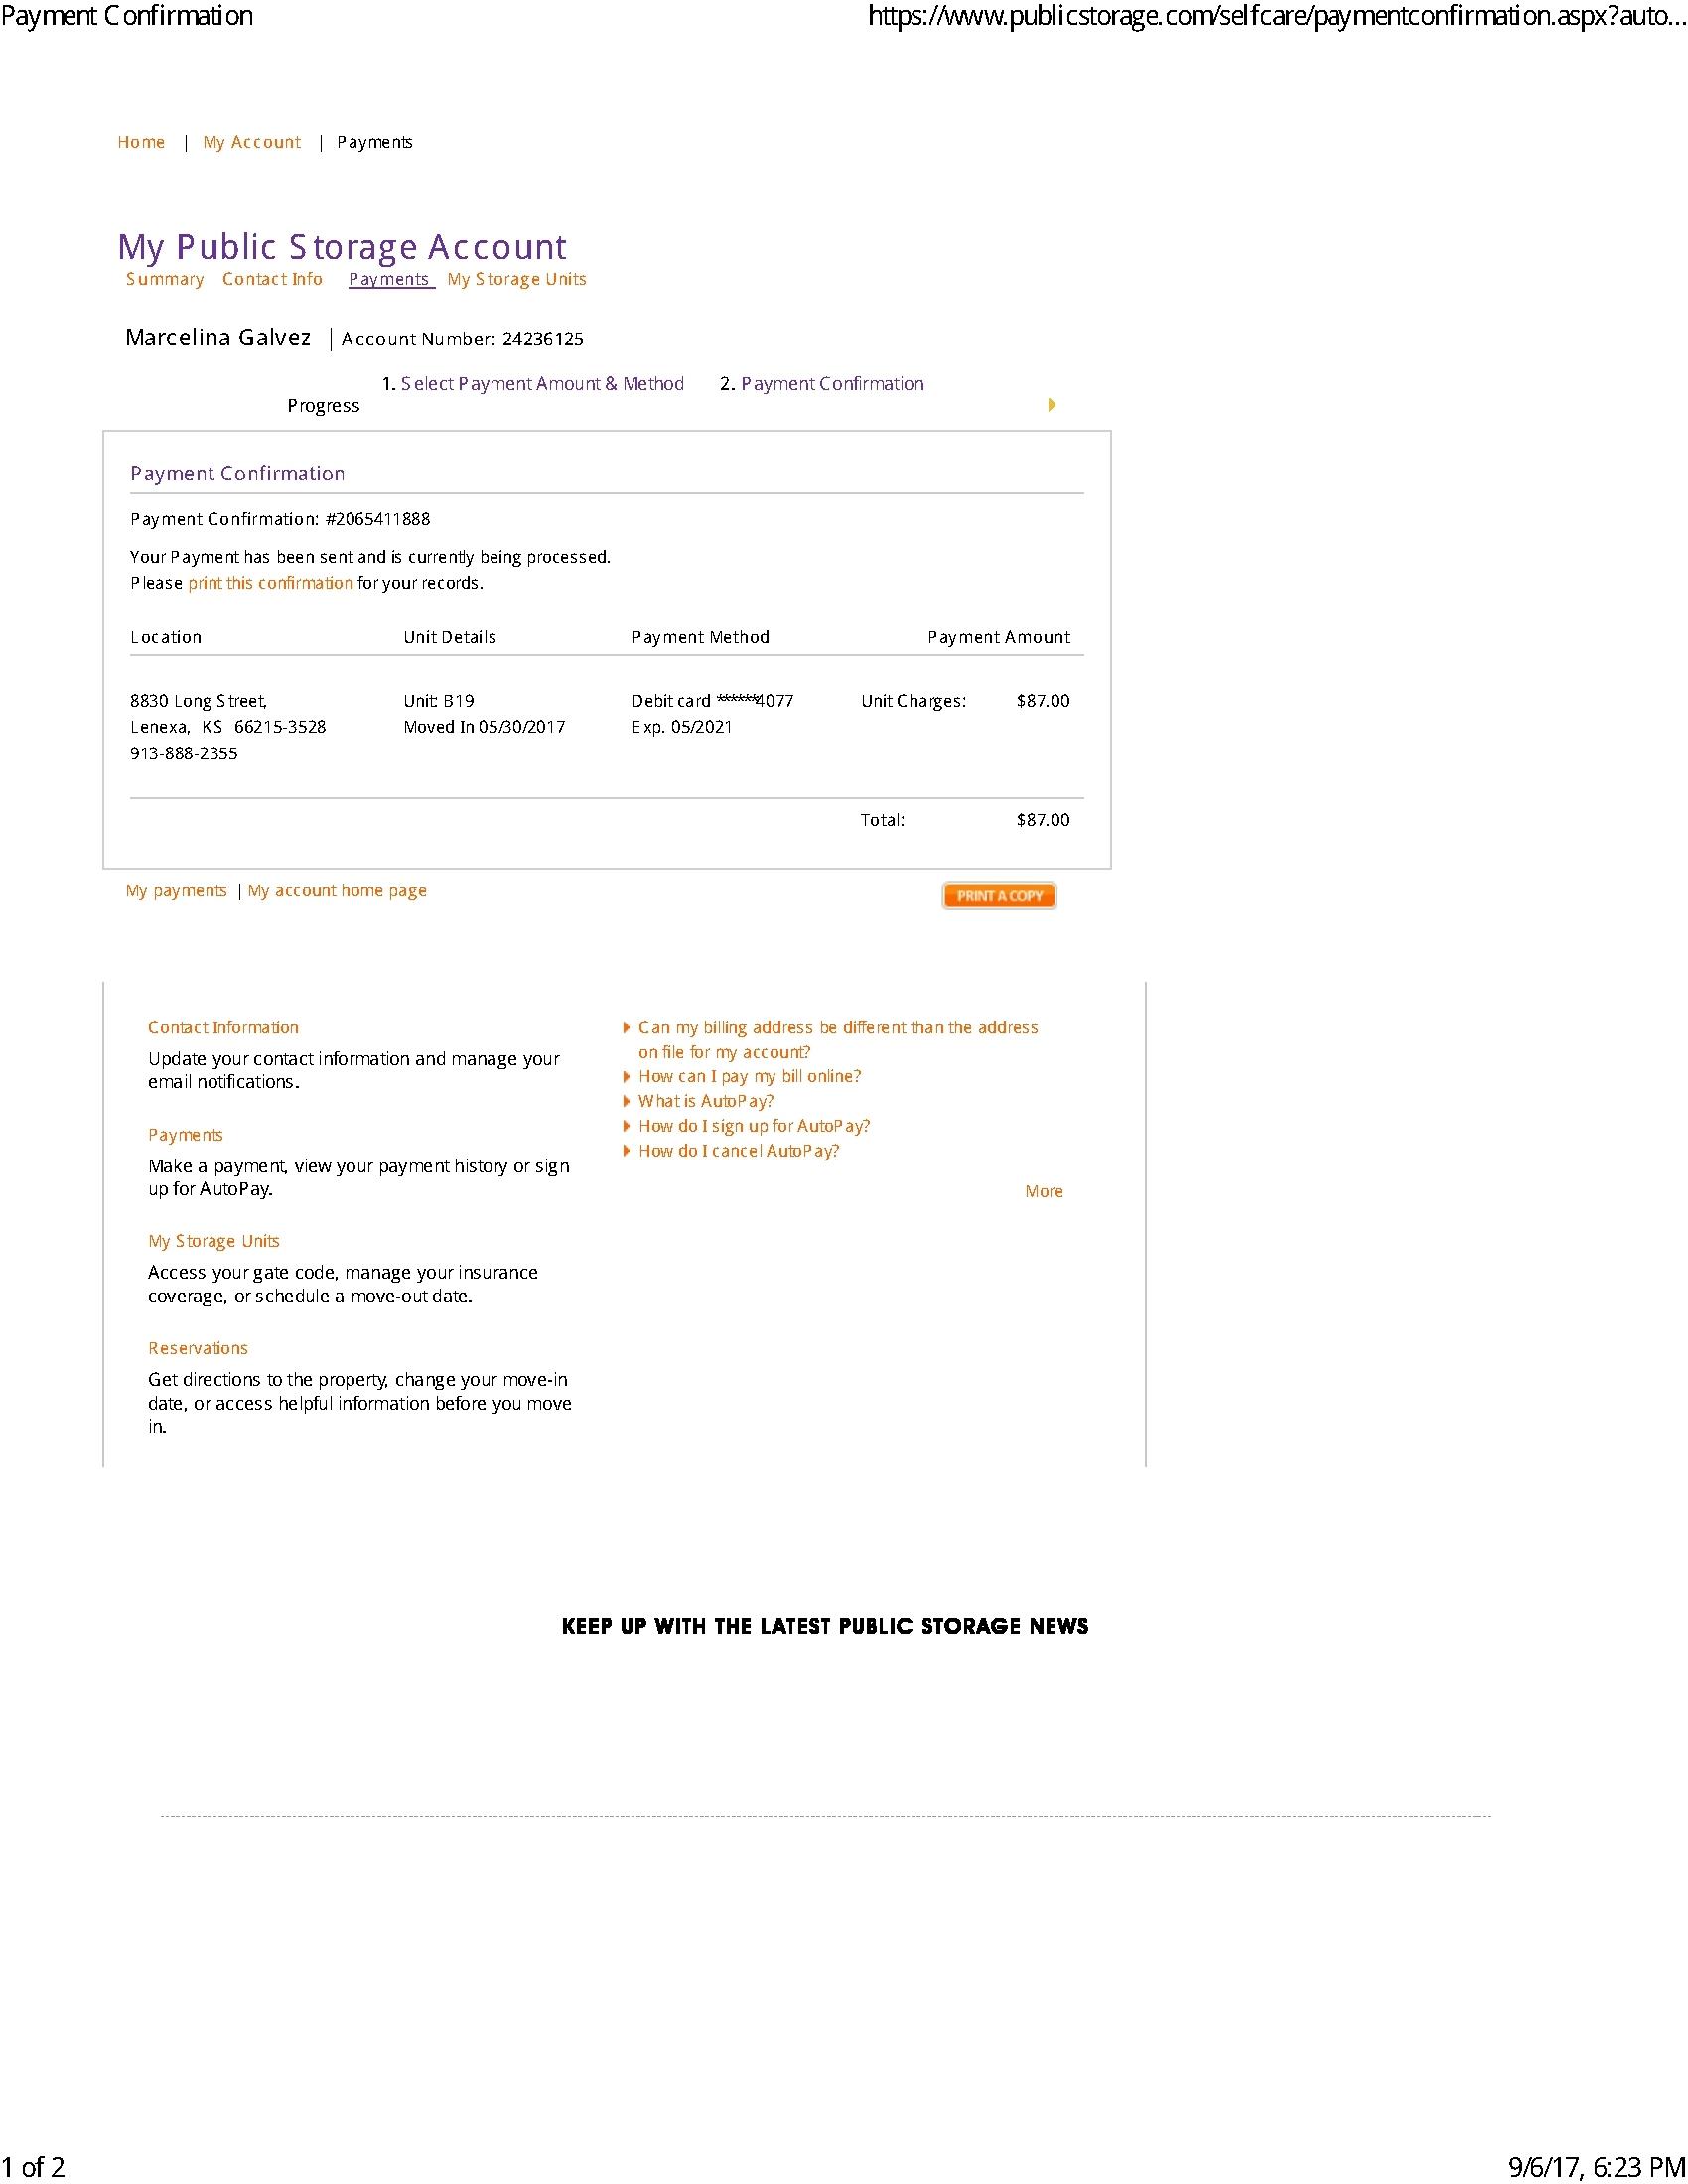 Marcelina Public Storage Complaint 2017 1504742110 Jpg